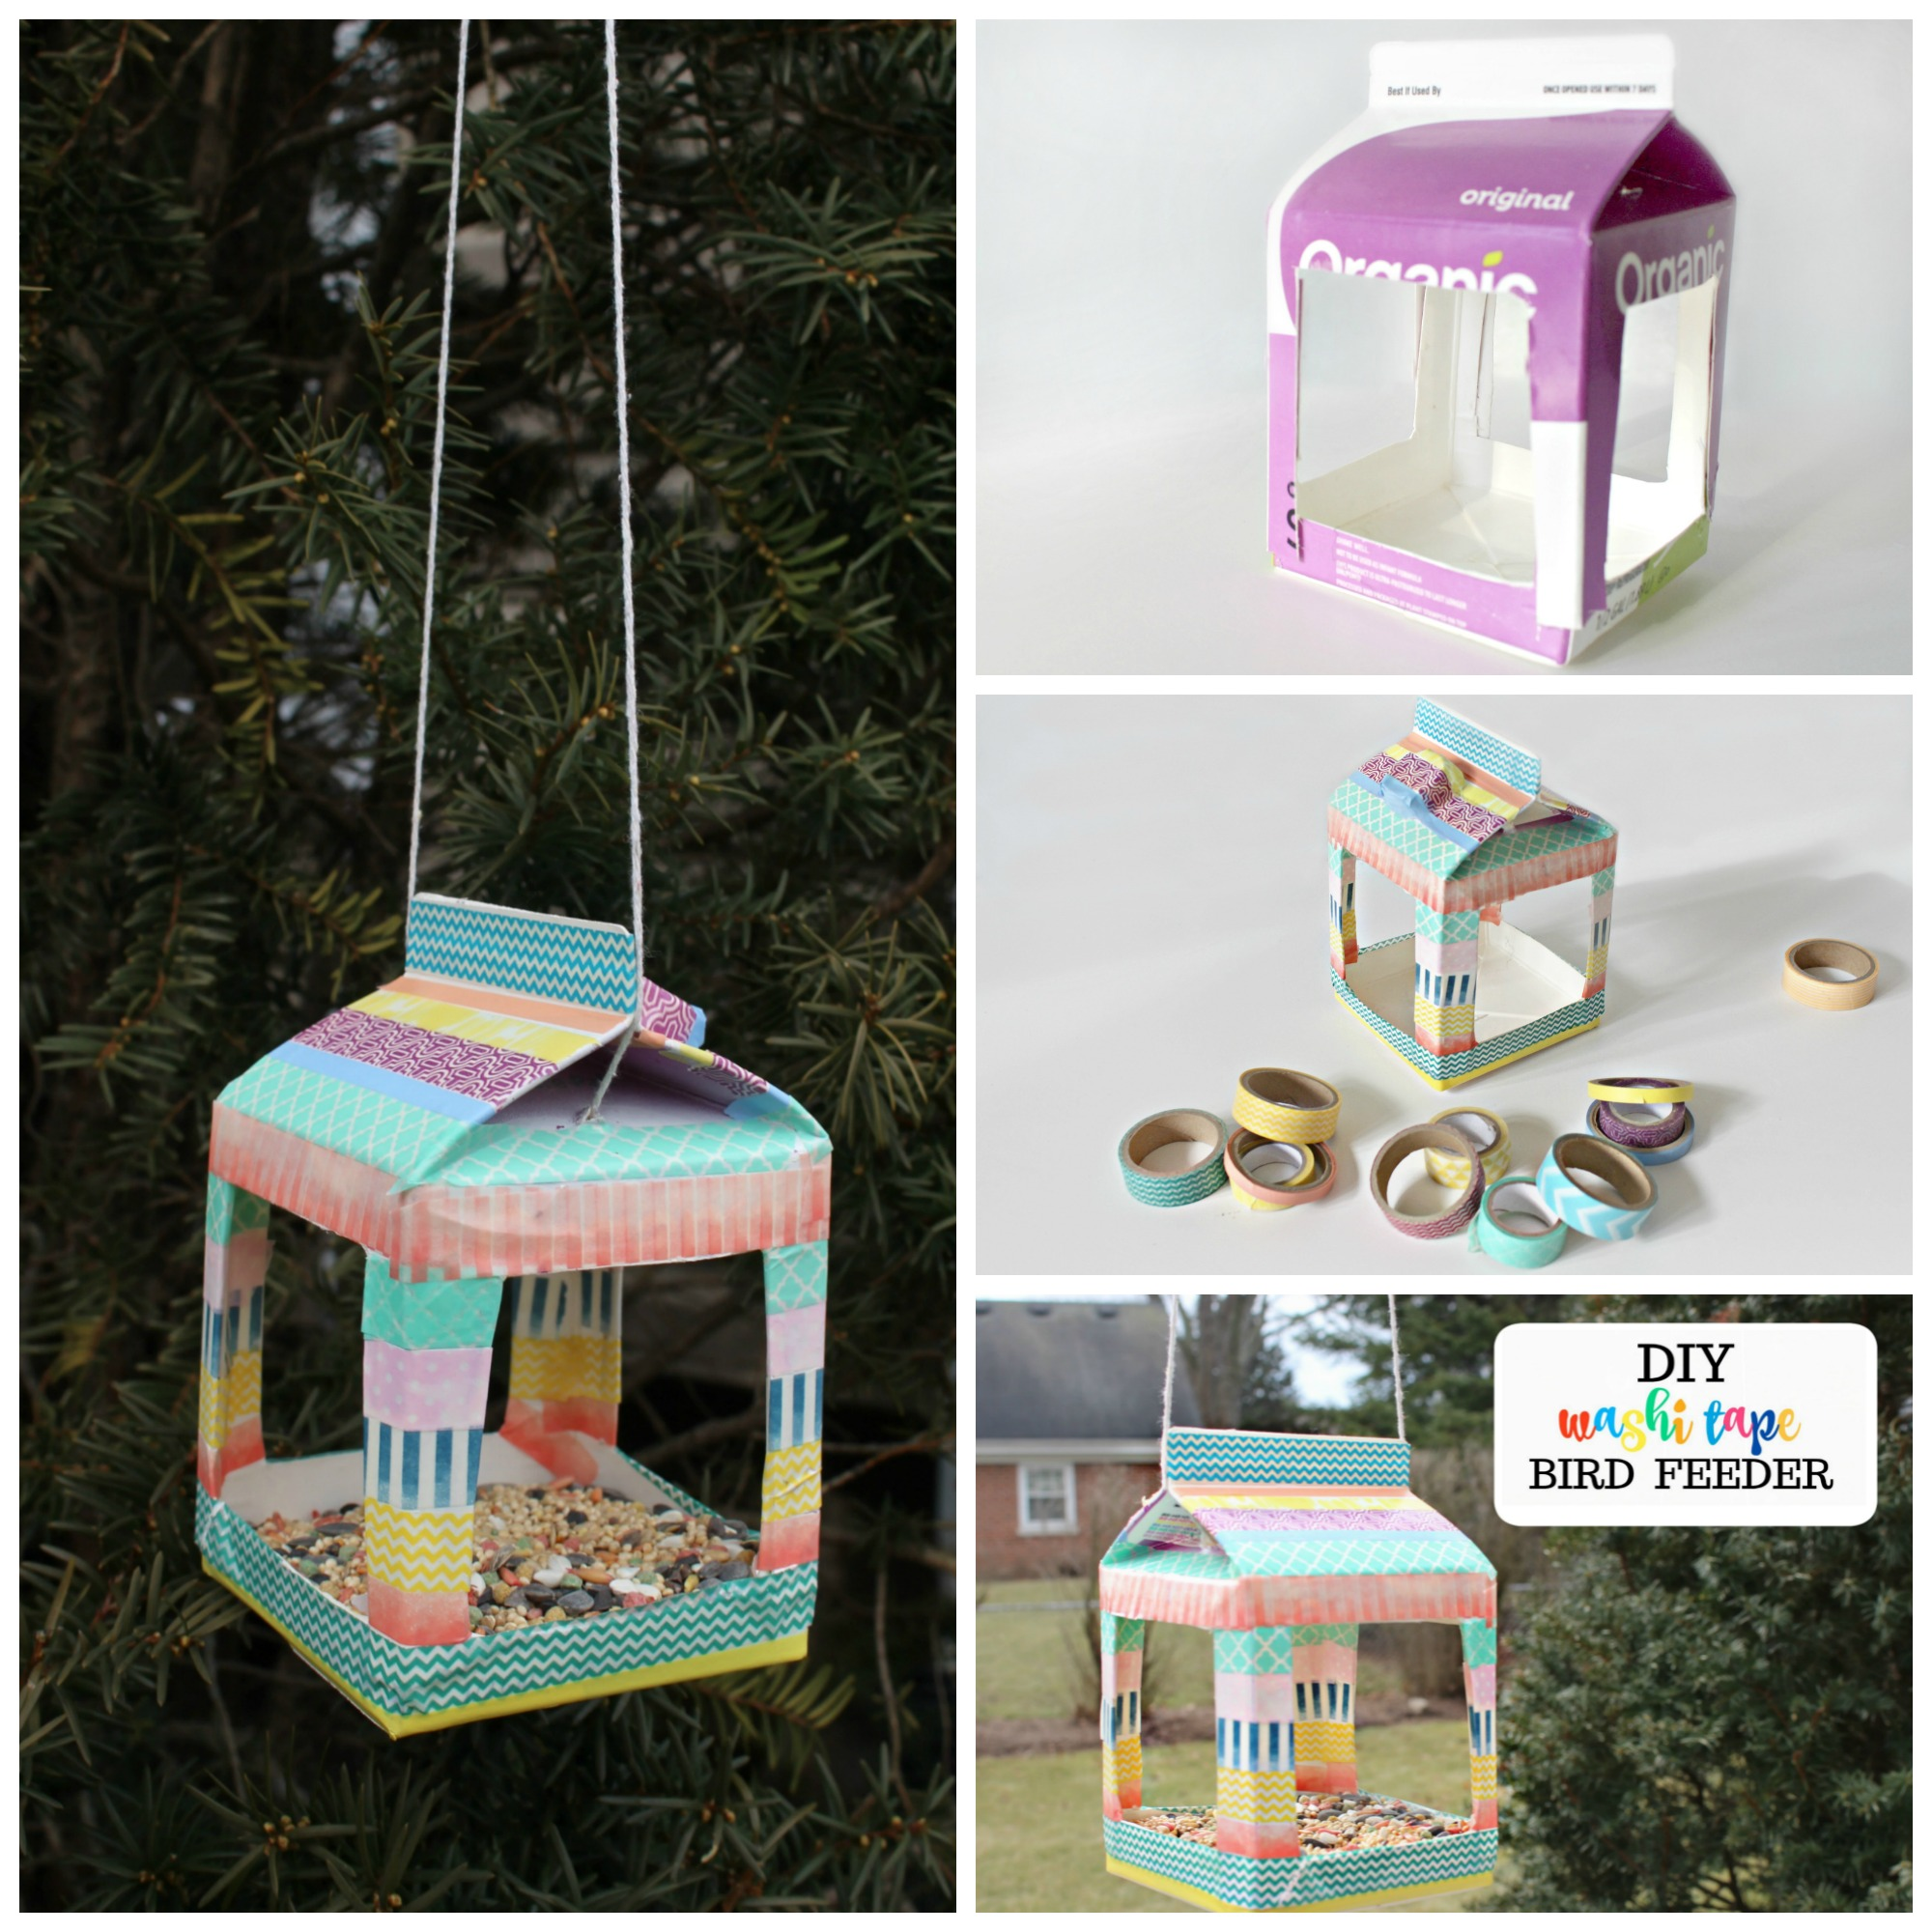 washi tape bird feeder